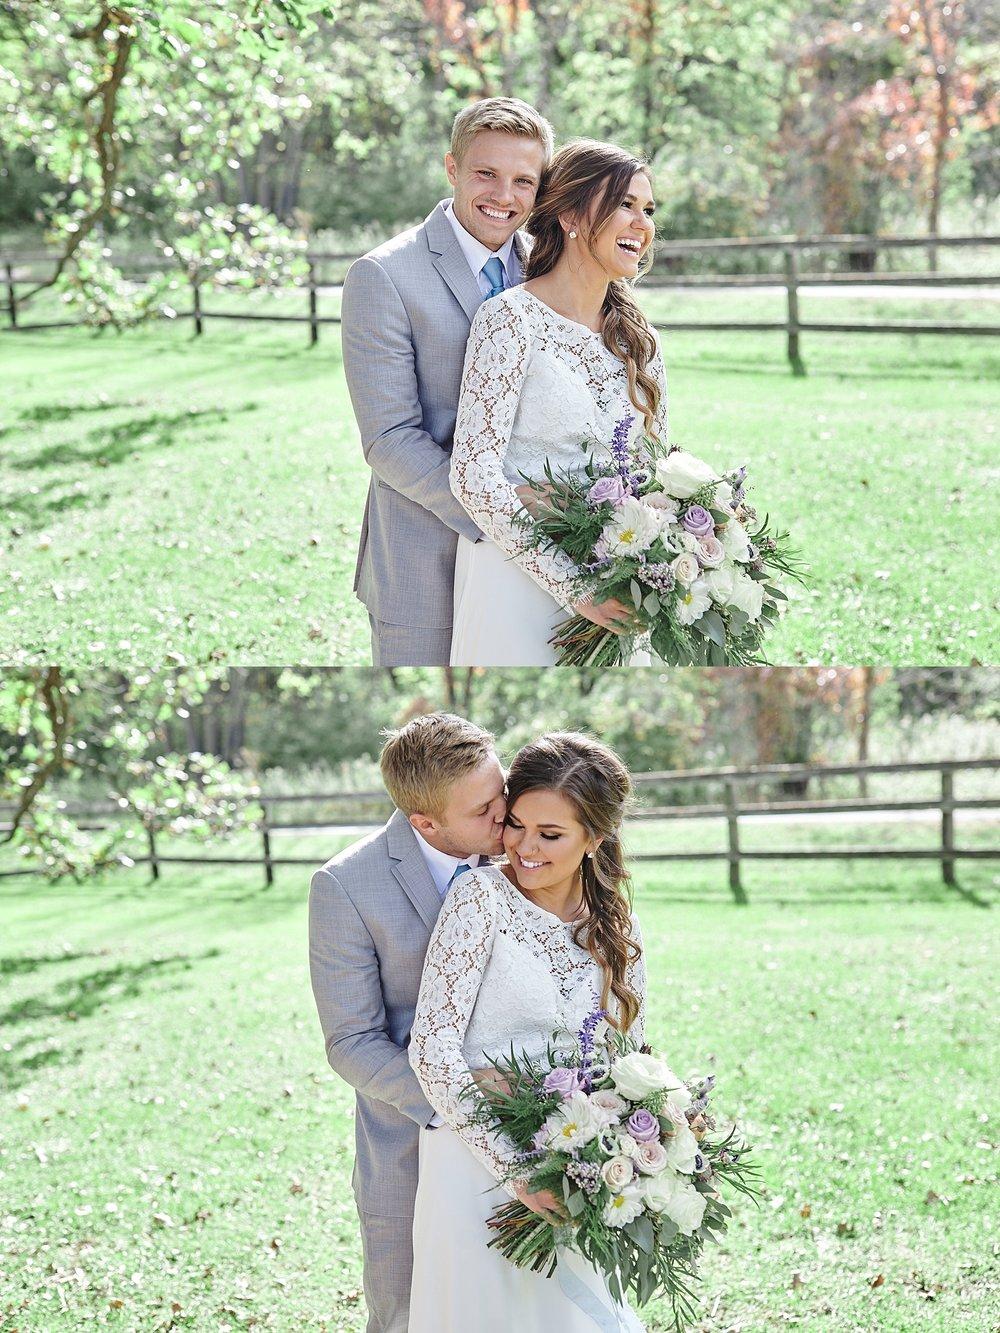 Maywood-Stone-Barn-Wedding-Rochester-Minnesota-Perry-James-Photo_0593.jpg